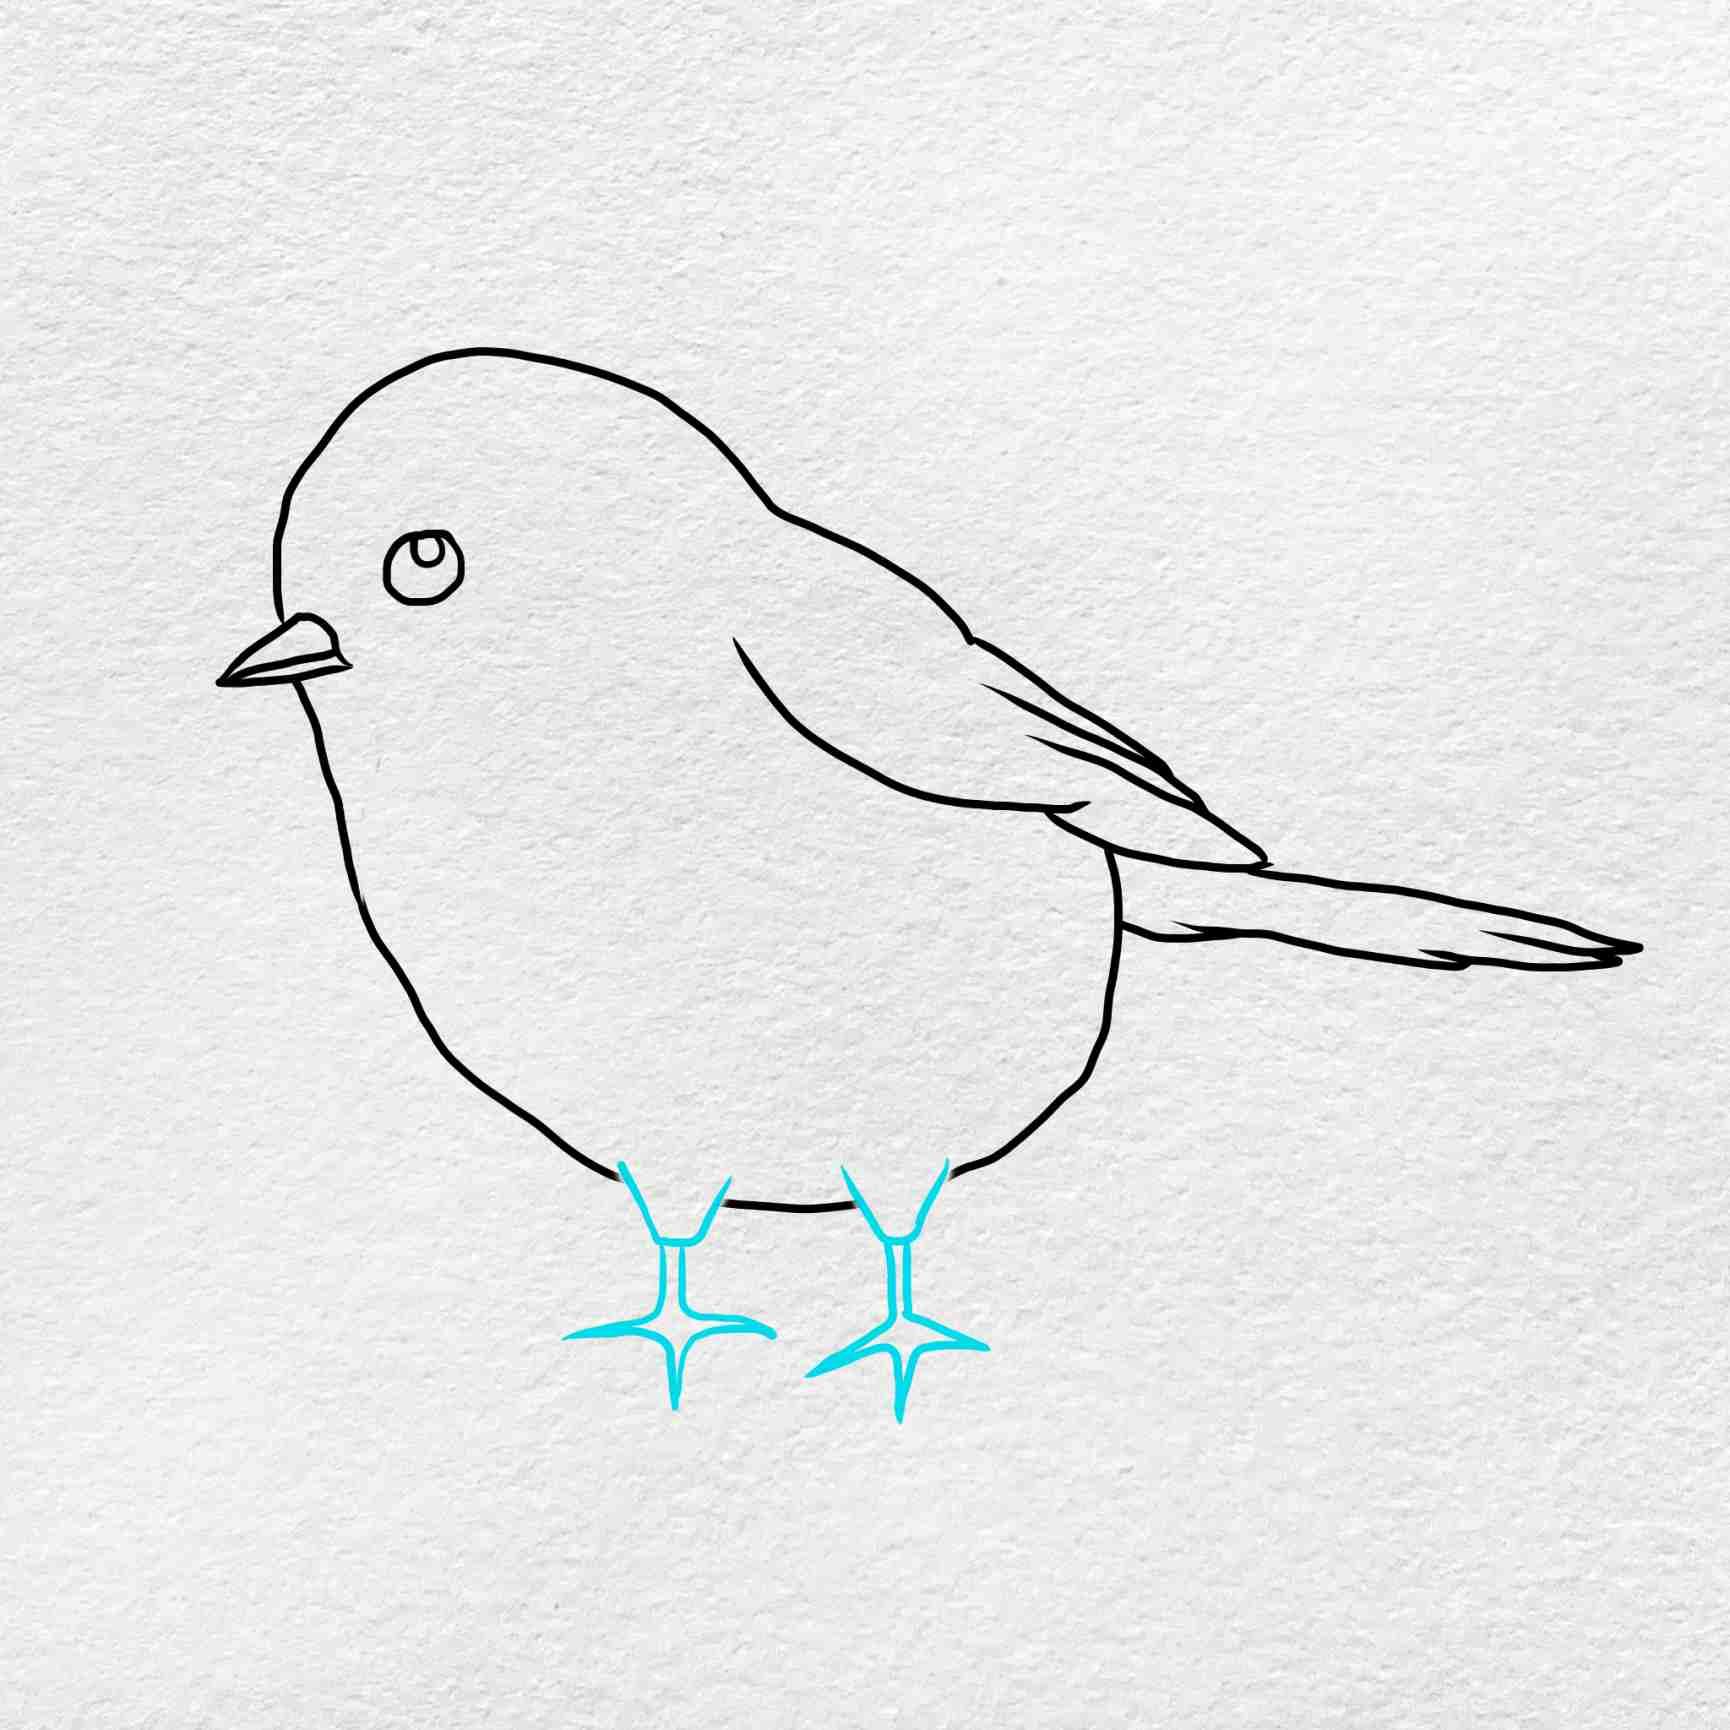 How To Draw Chickadee: Step 5